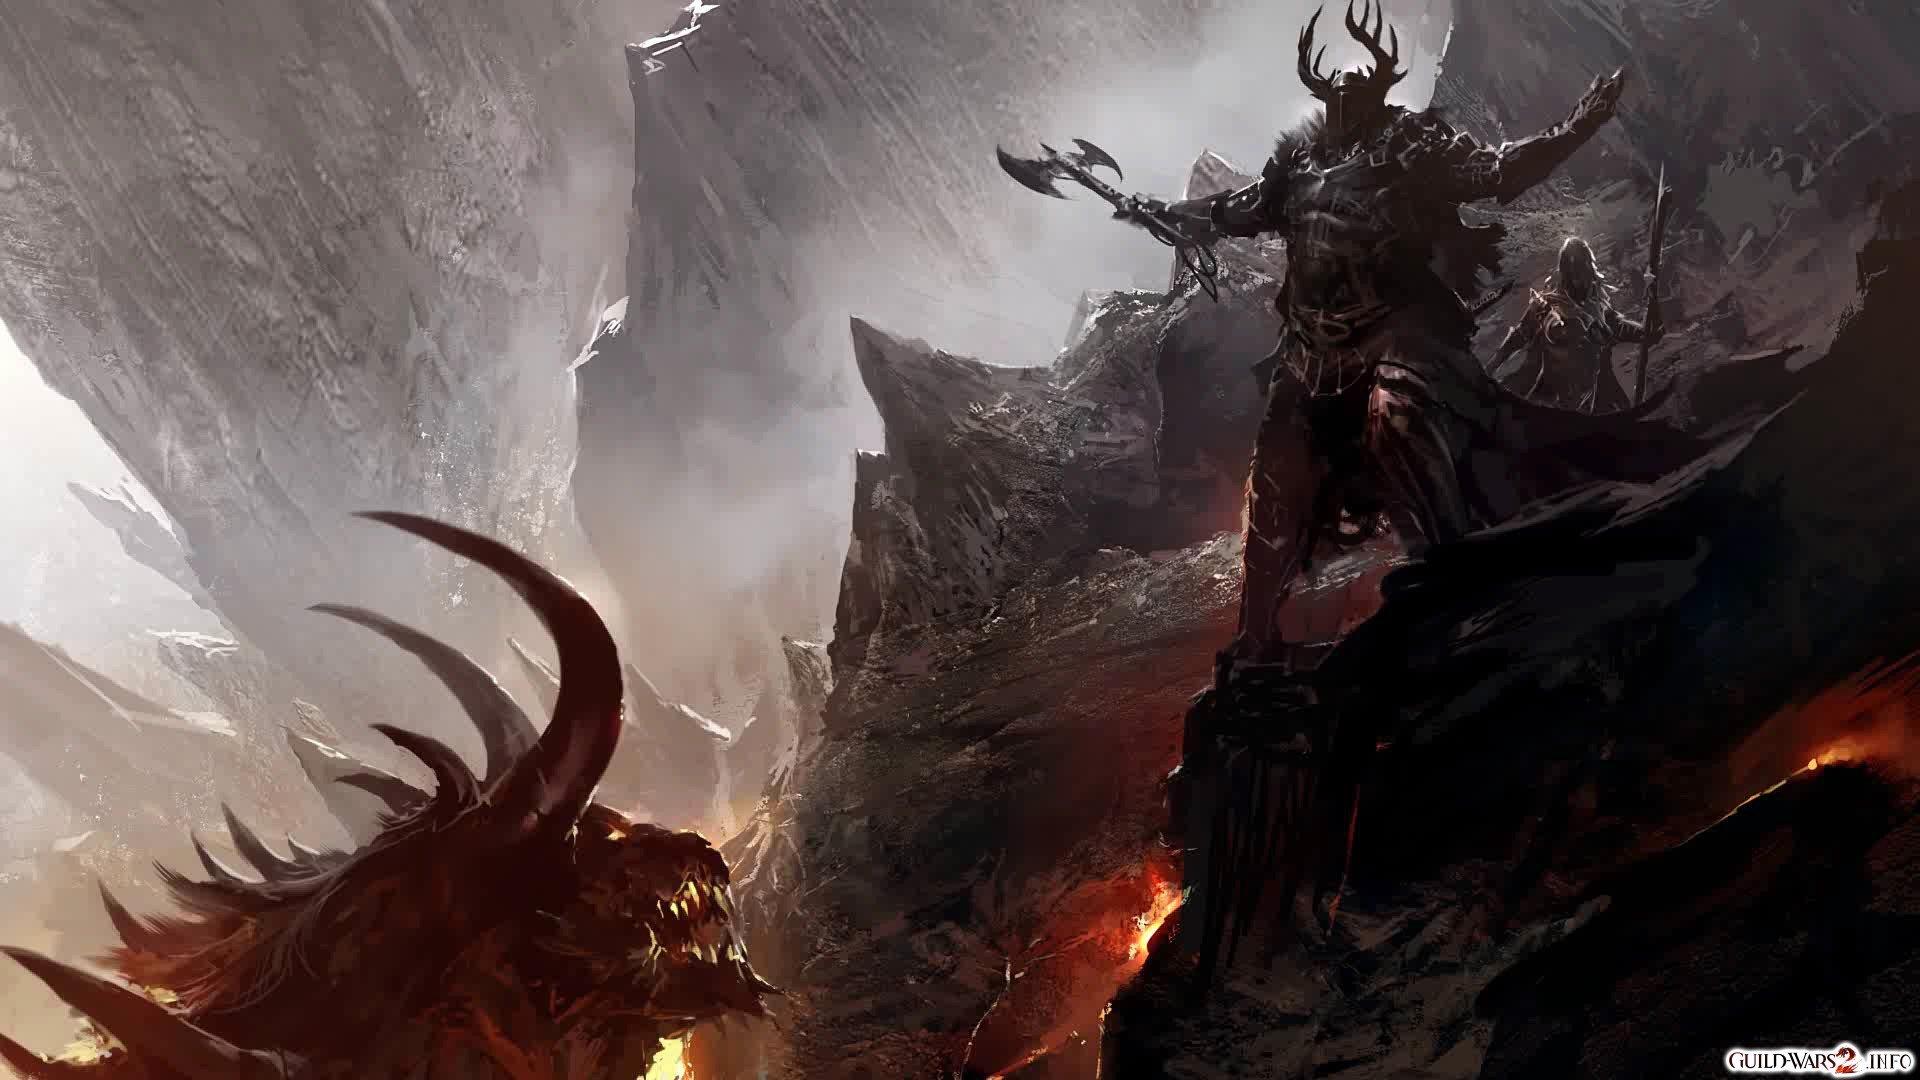 Download Guild Wars 2 453453 Hd Wallpaper Backgrounds